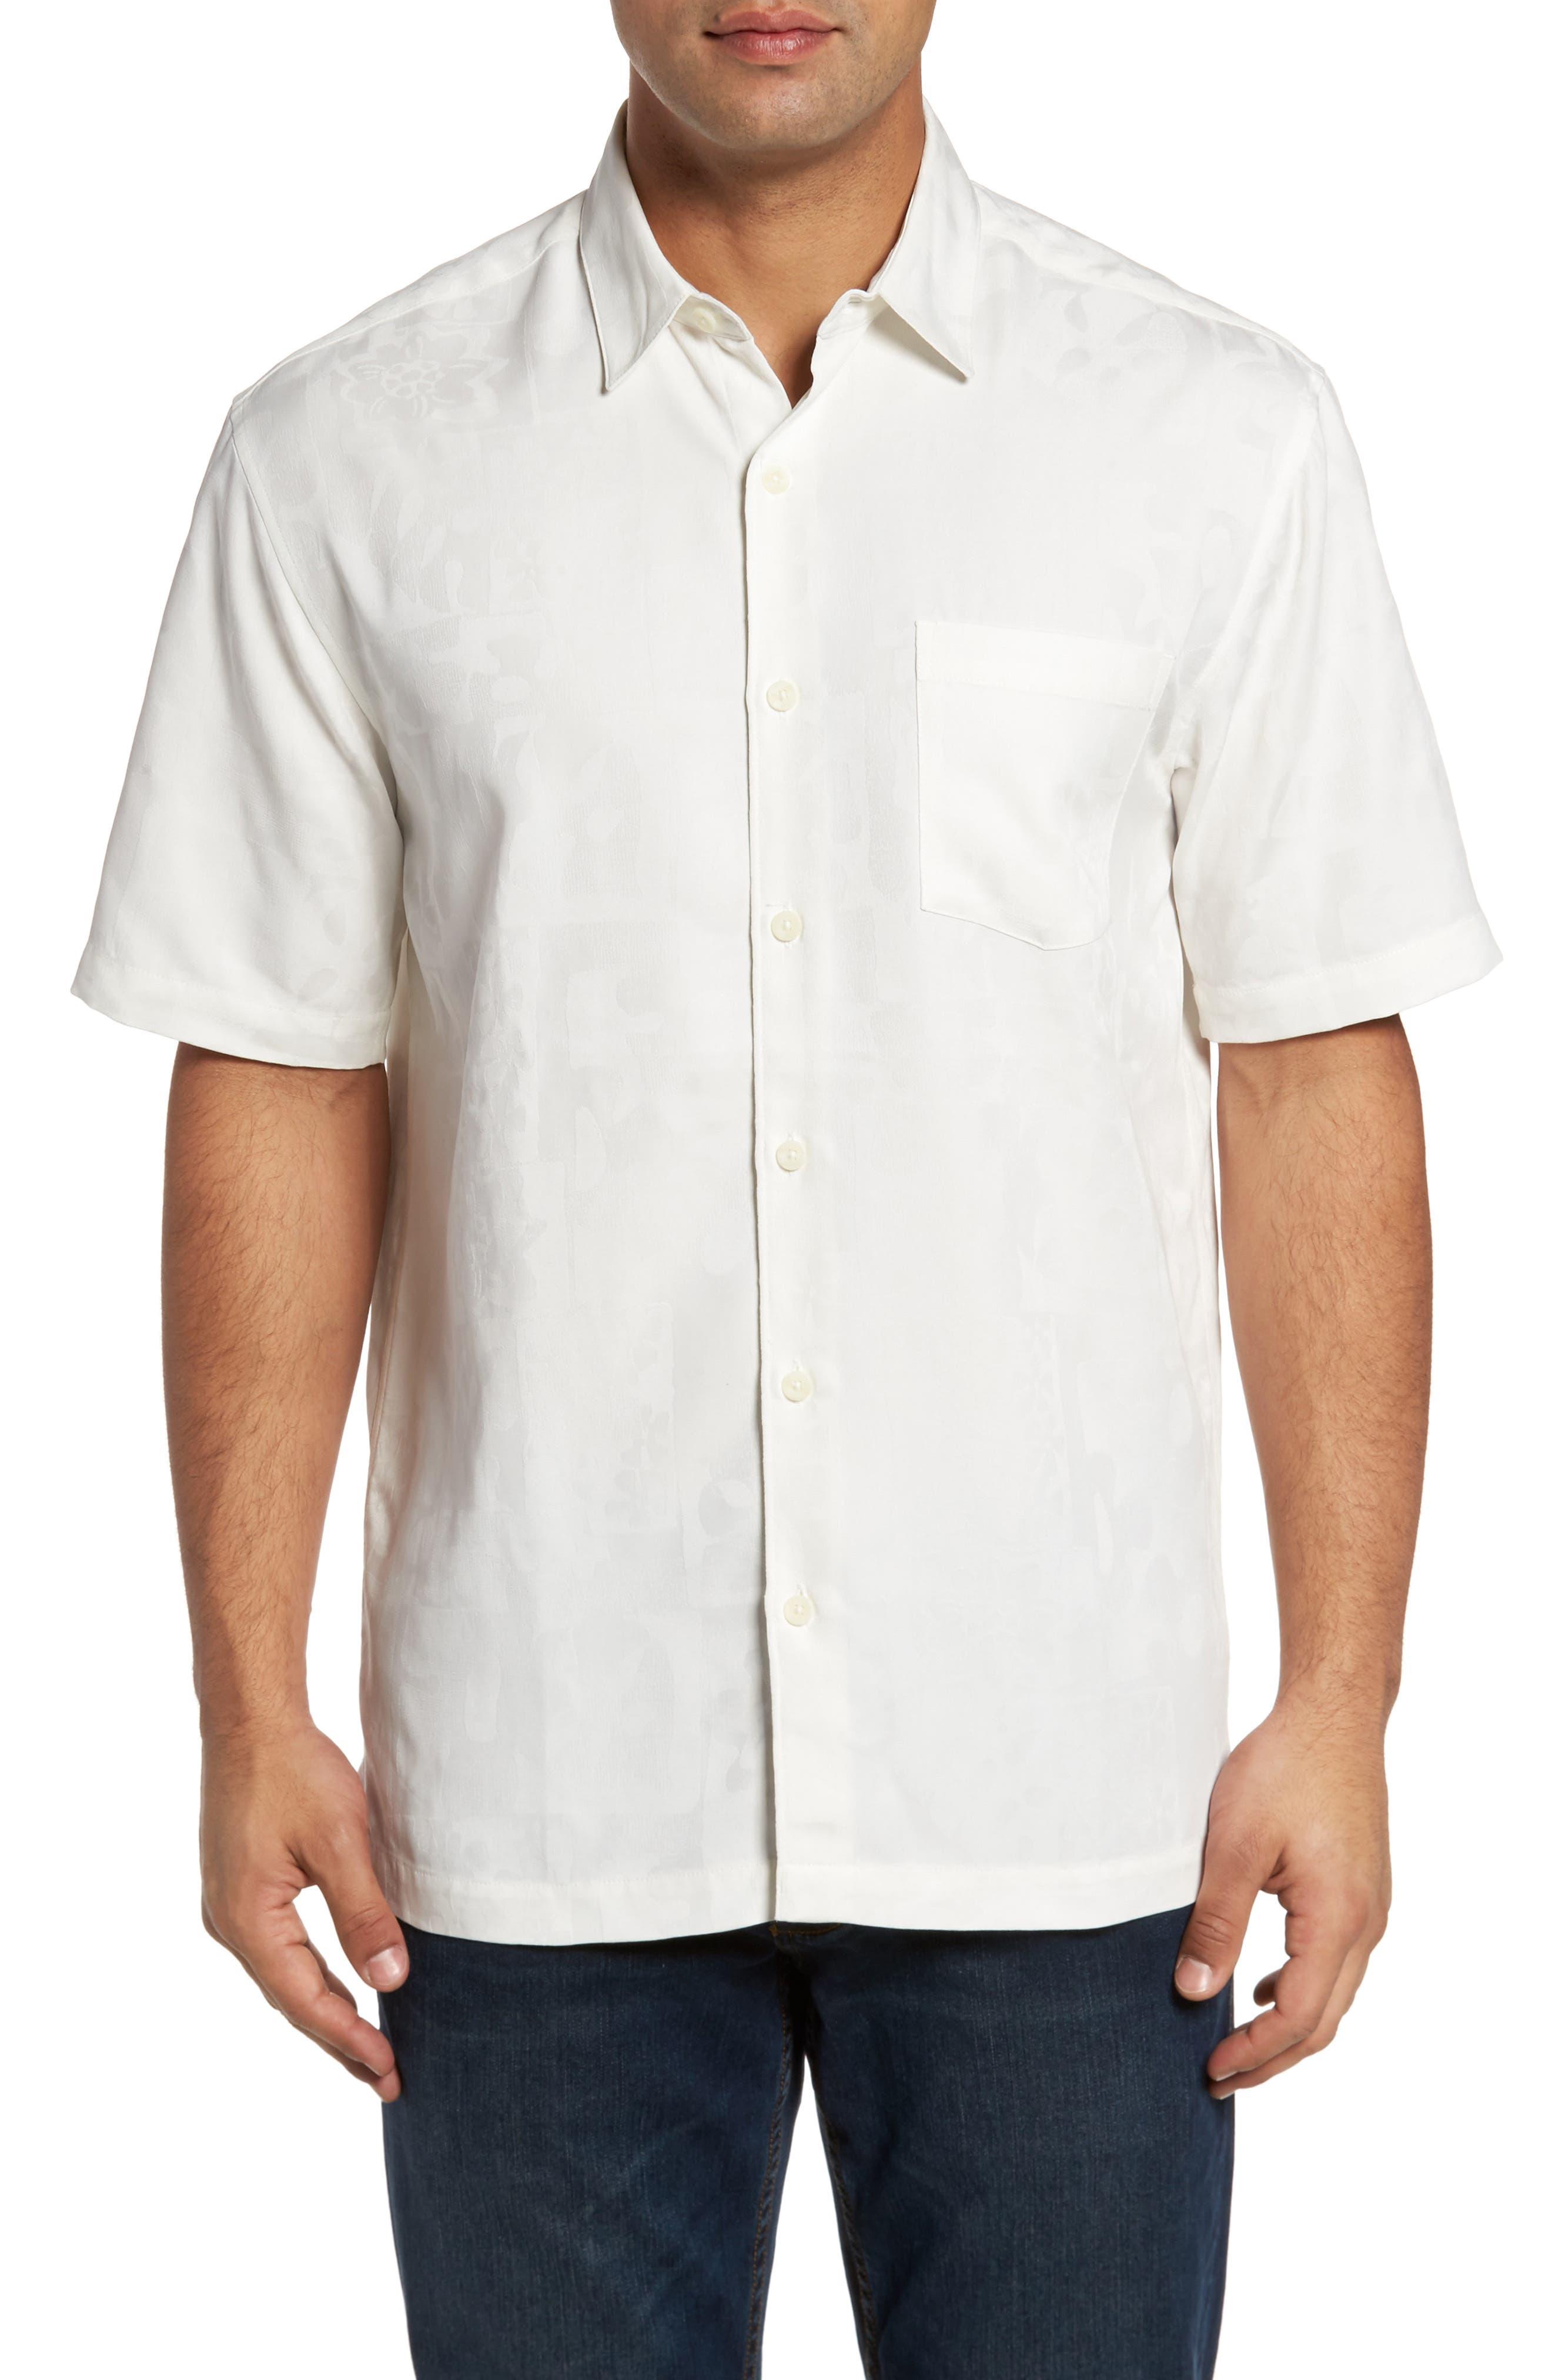 Main Image - Kahala Pahu Classic Fit Sport Shirt